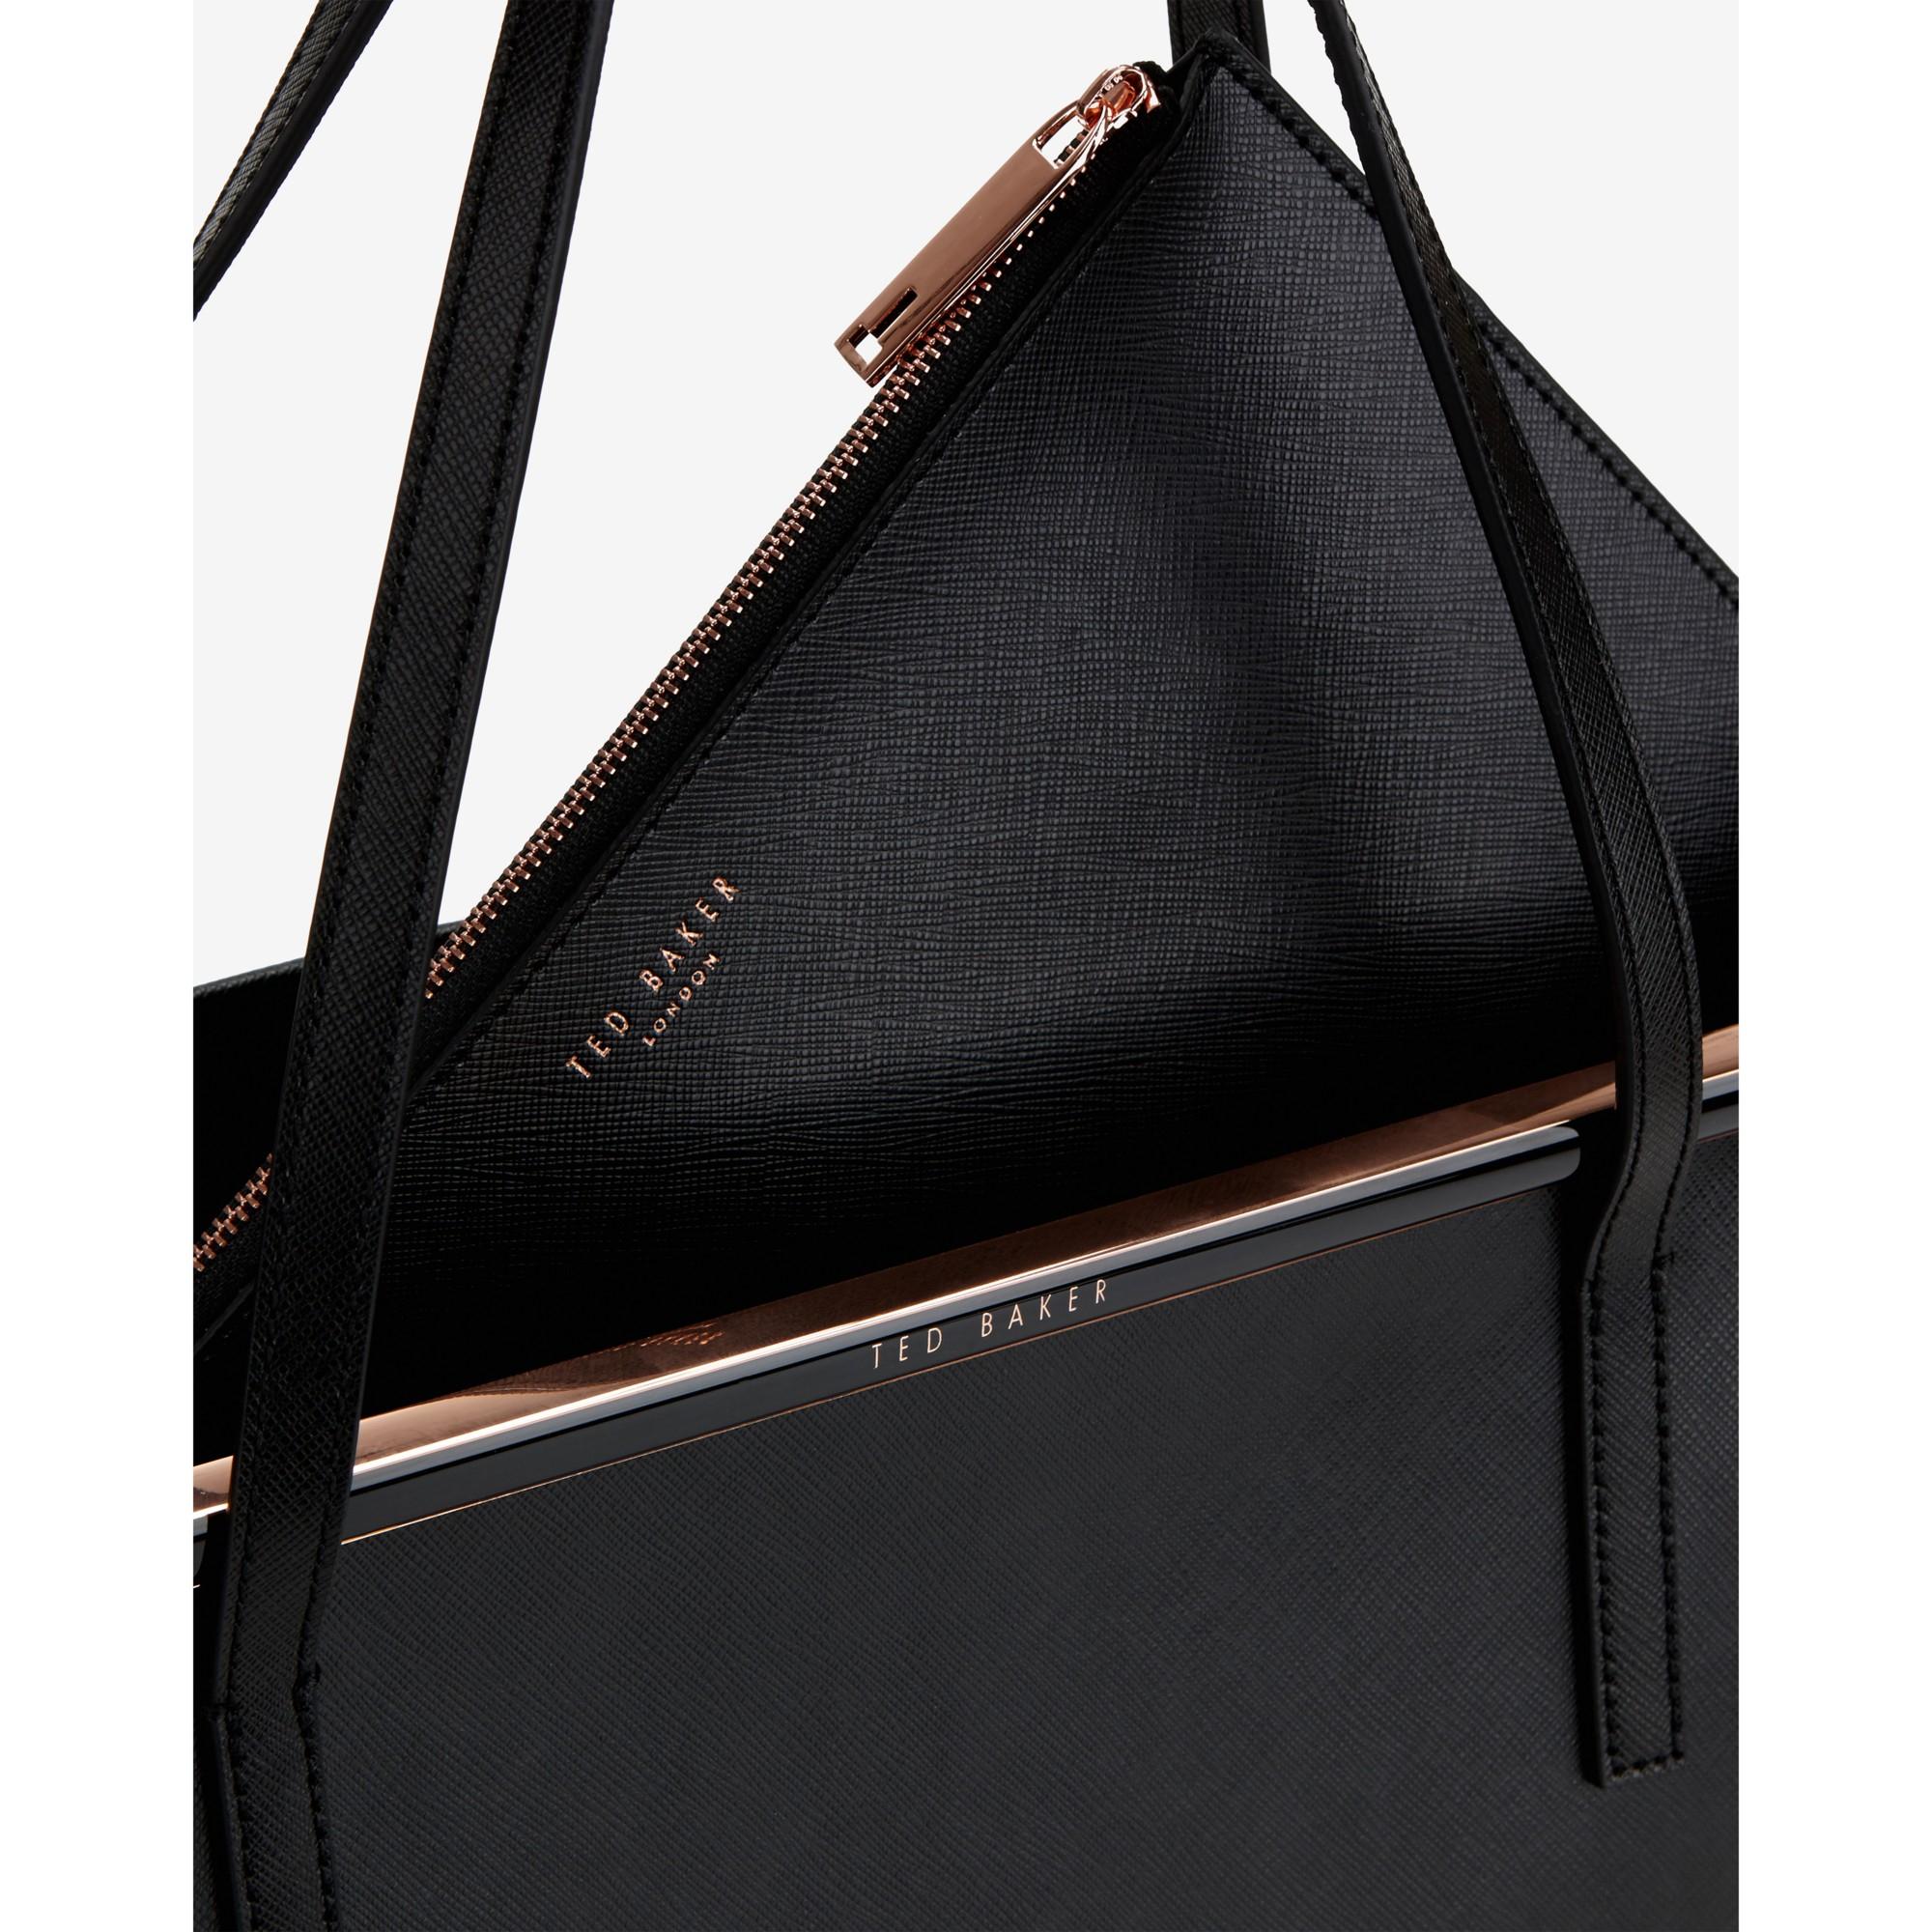 b1005a6d1 Ted Baker Celiaa Crosshatch Leather Shopper Bag in Black - Lyst